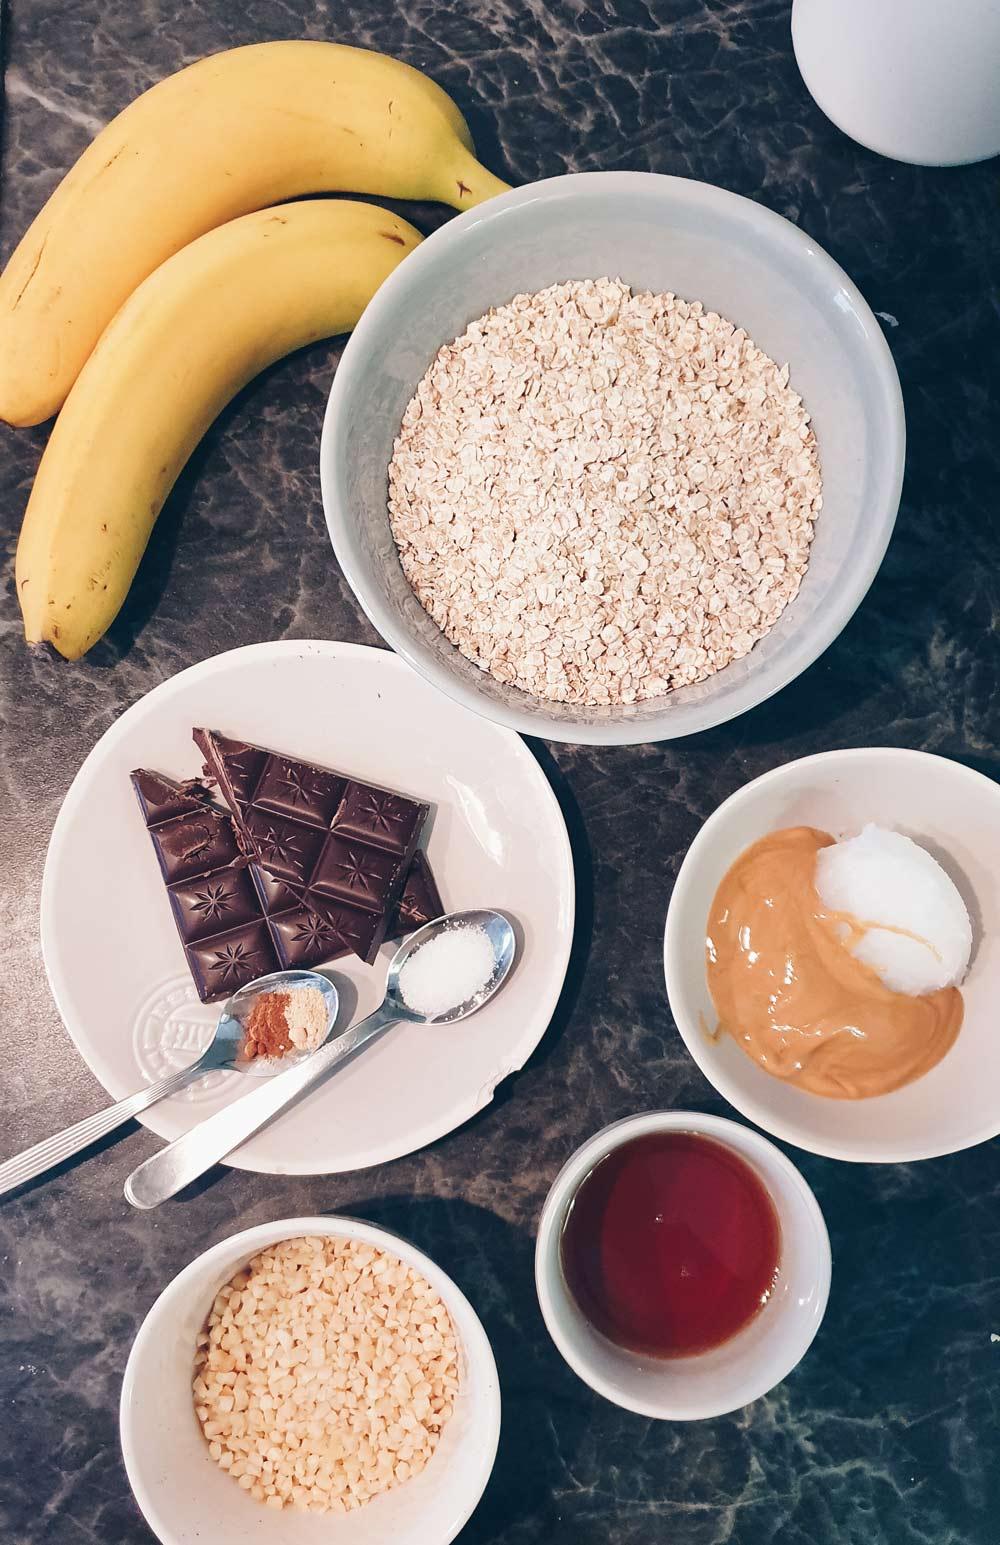 Zutaten vegane Bananen-Schoko-Müsliriegel